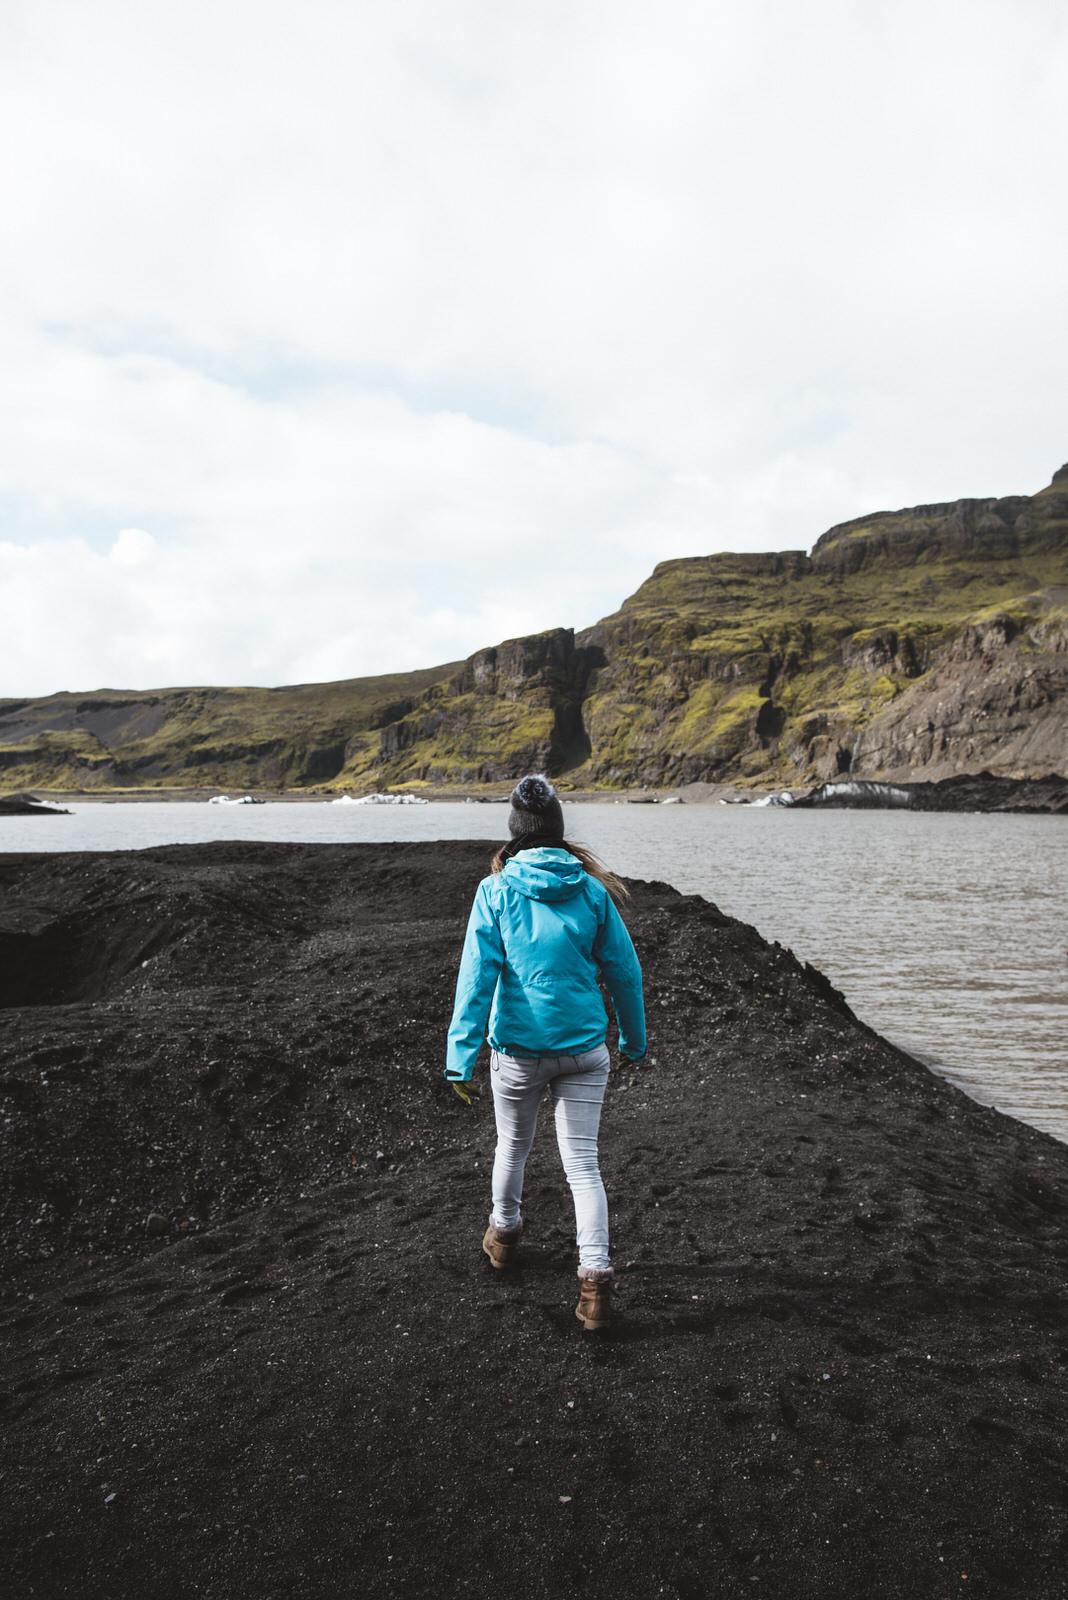 iceland road trip day 3 - fjadrargljufur solheimajokull dyrholaey